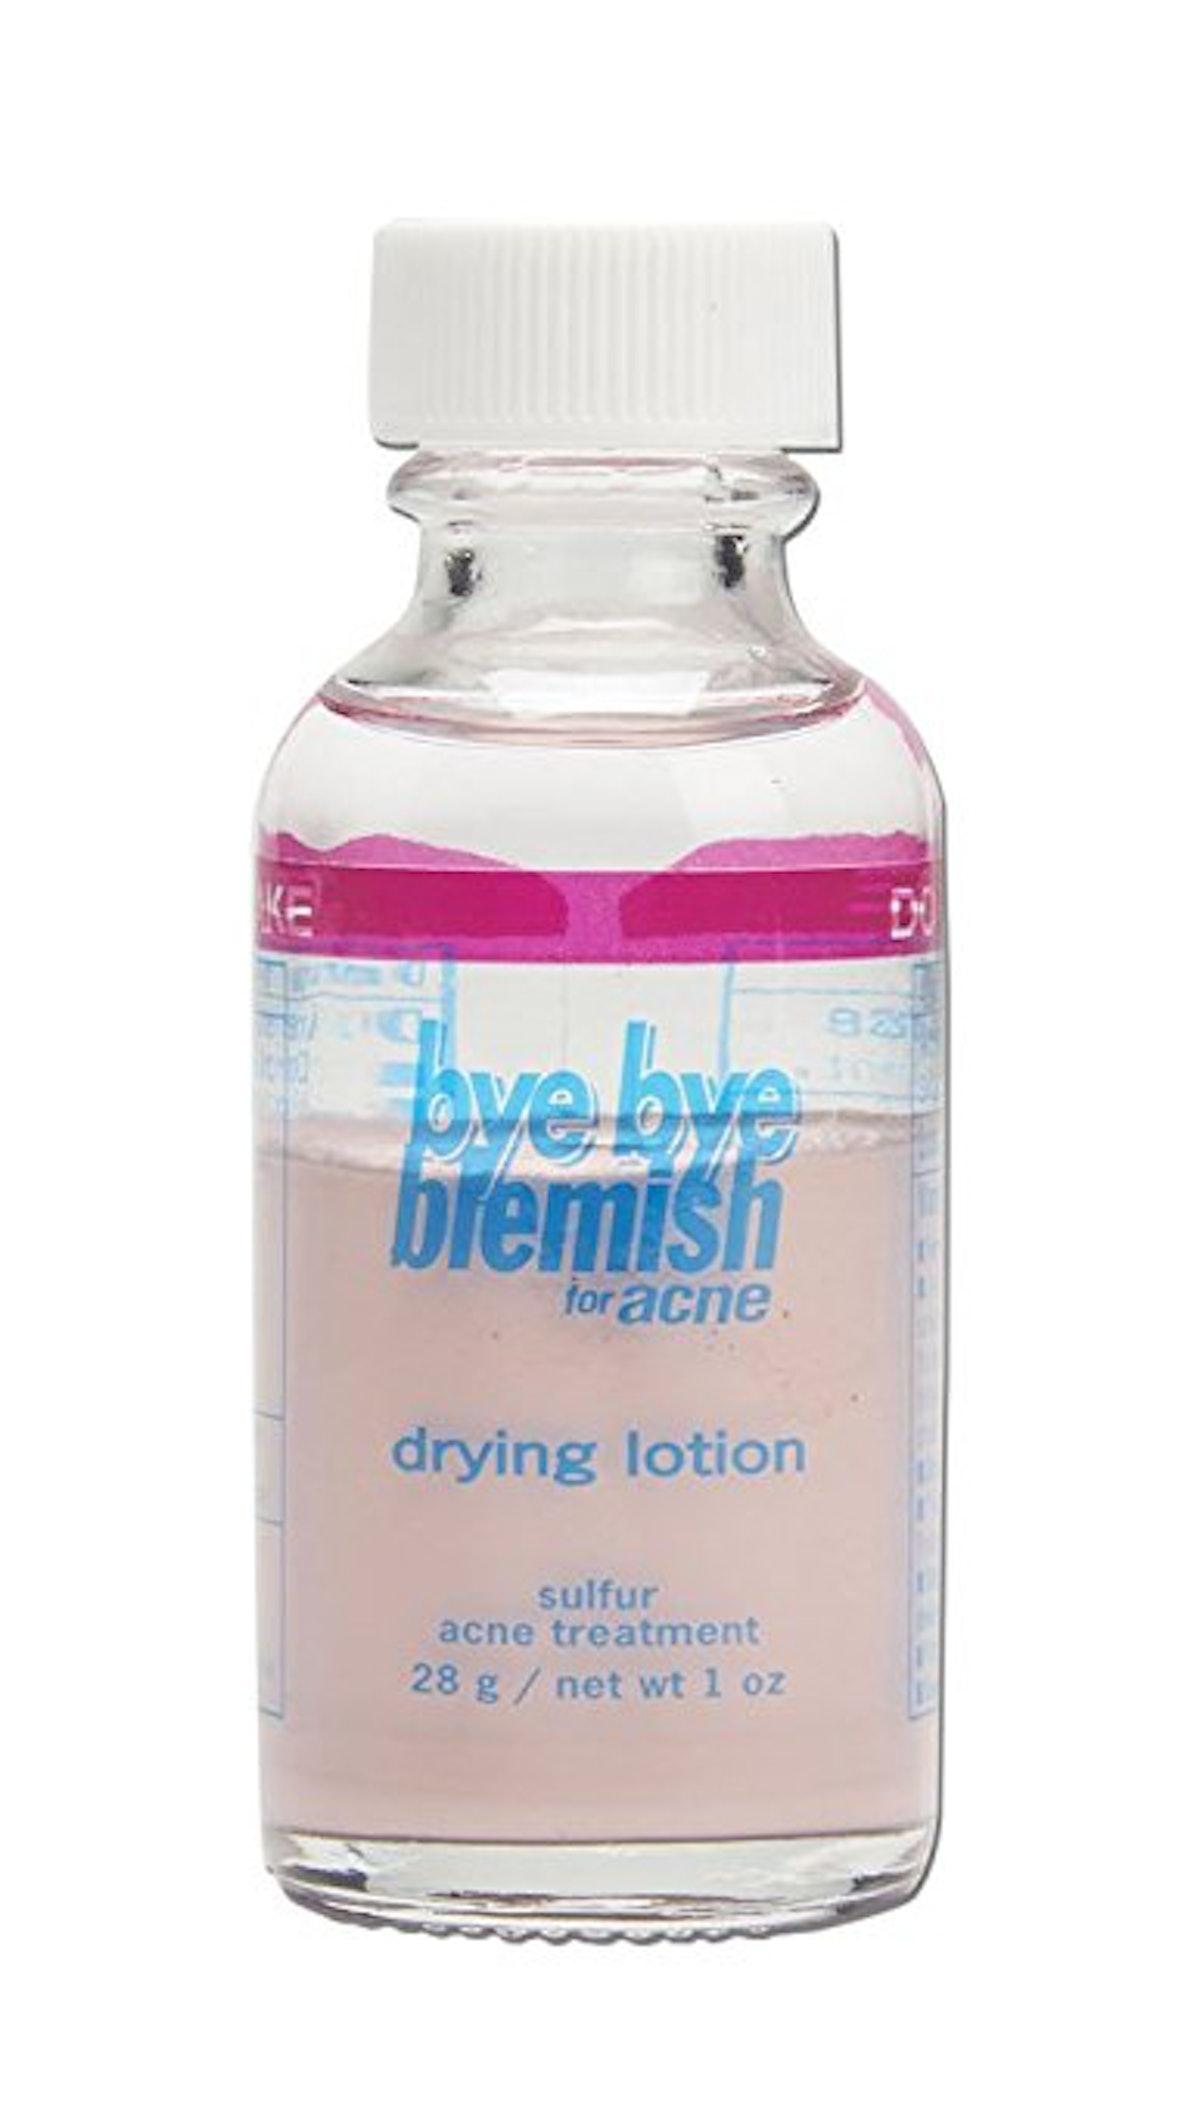 Bye Bye Blemish Acne Treatment Drying Lotion